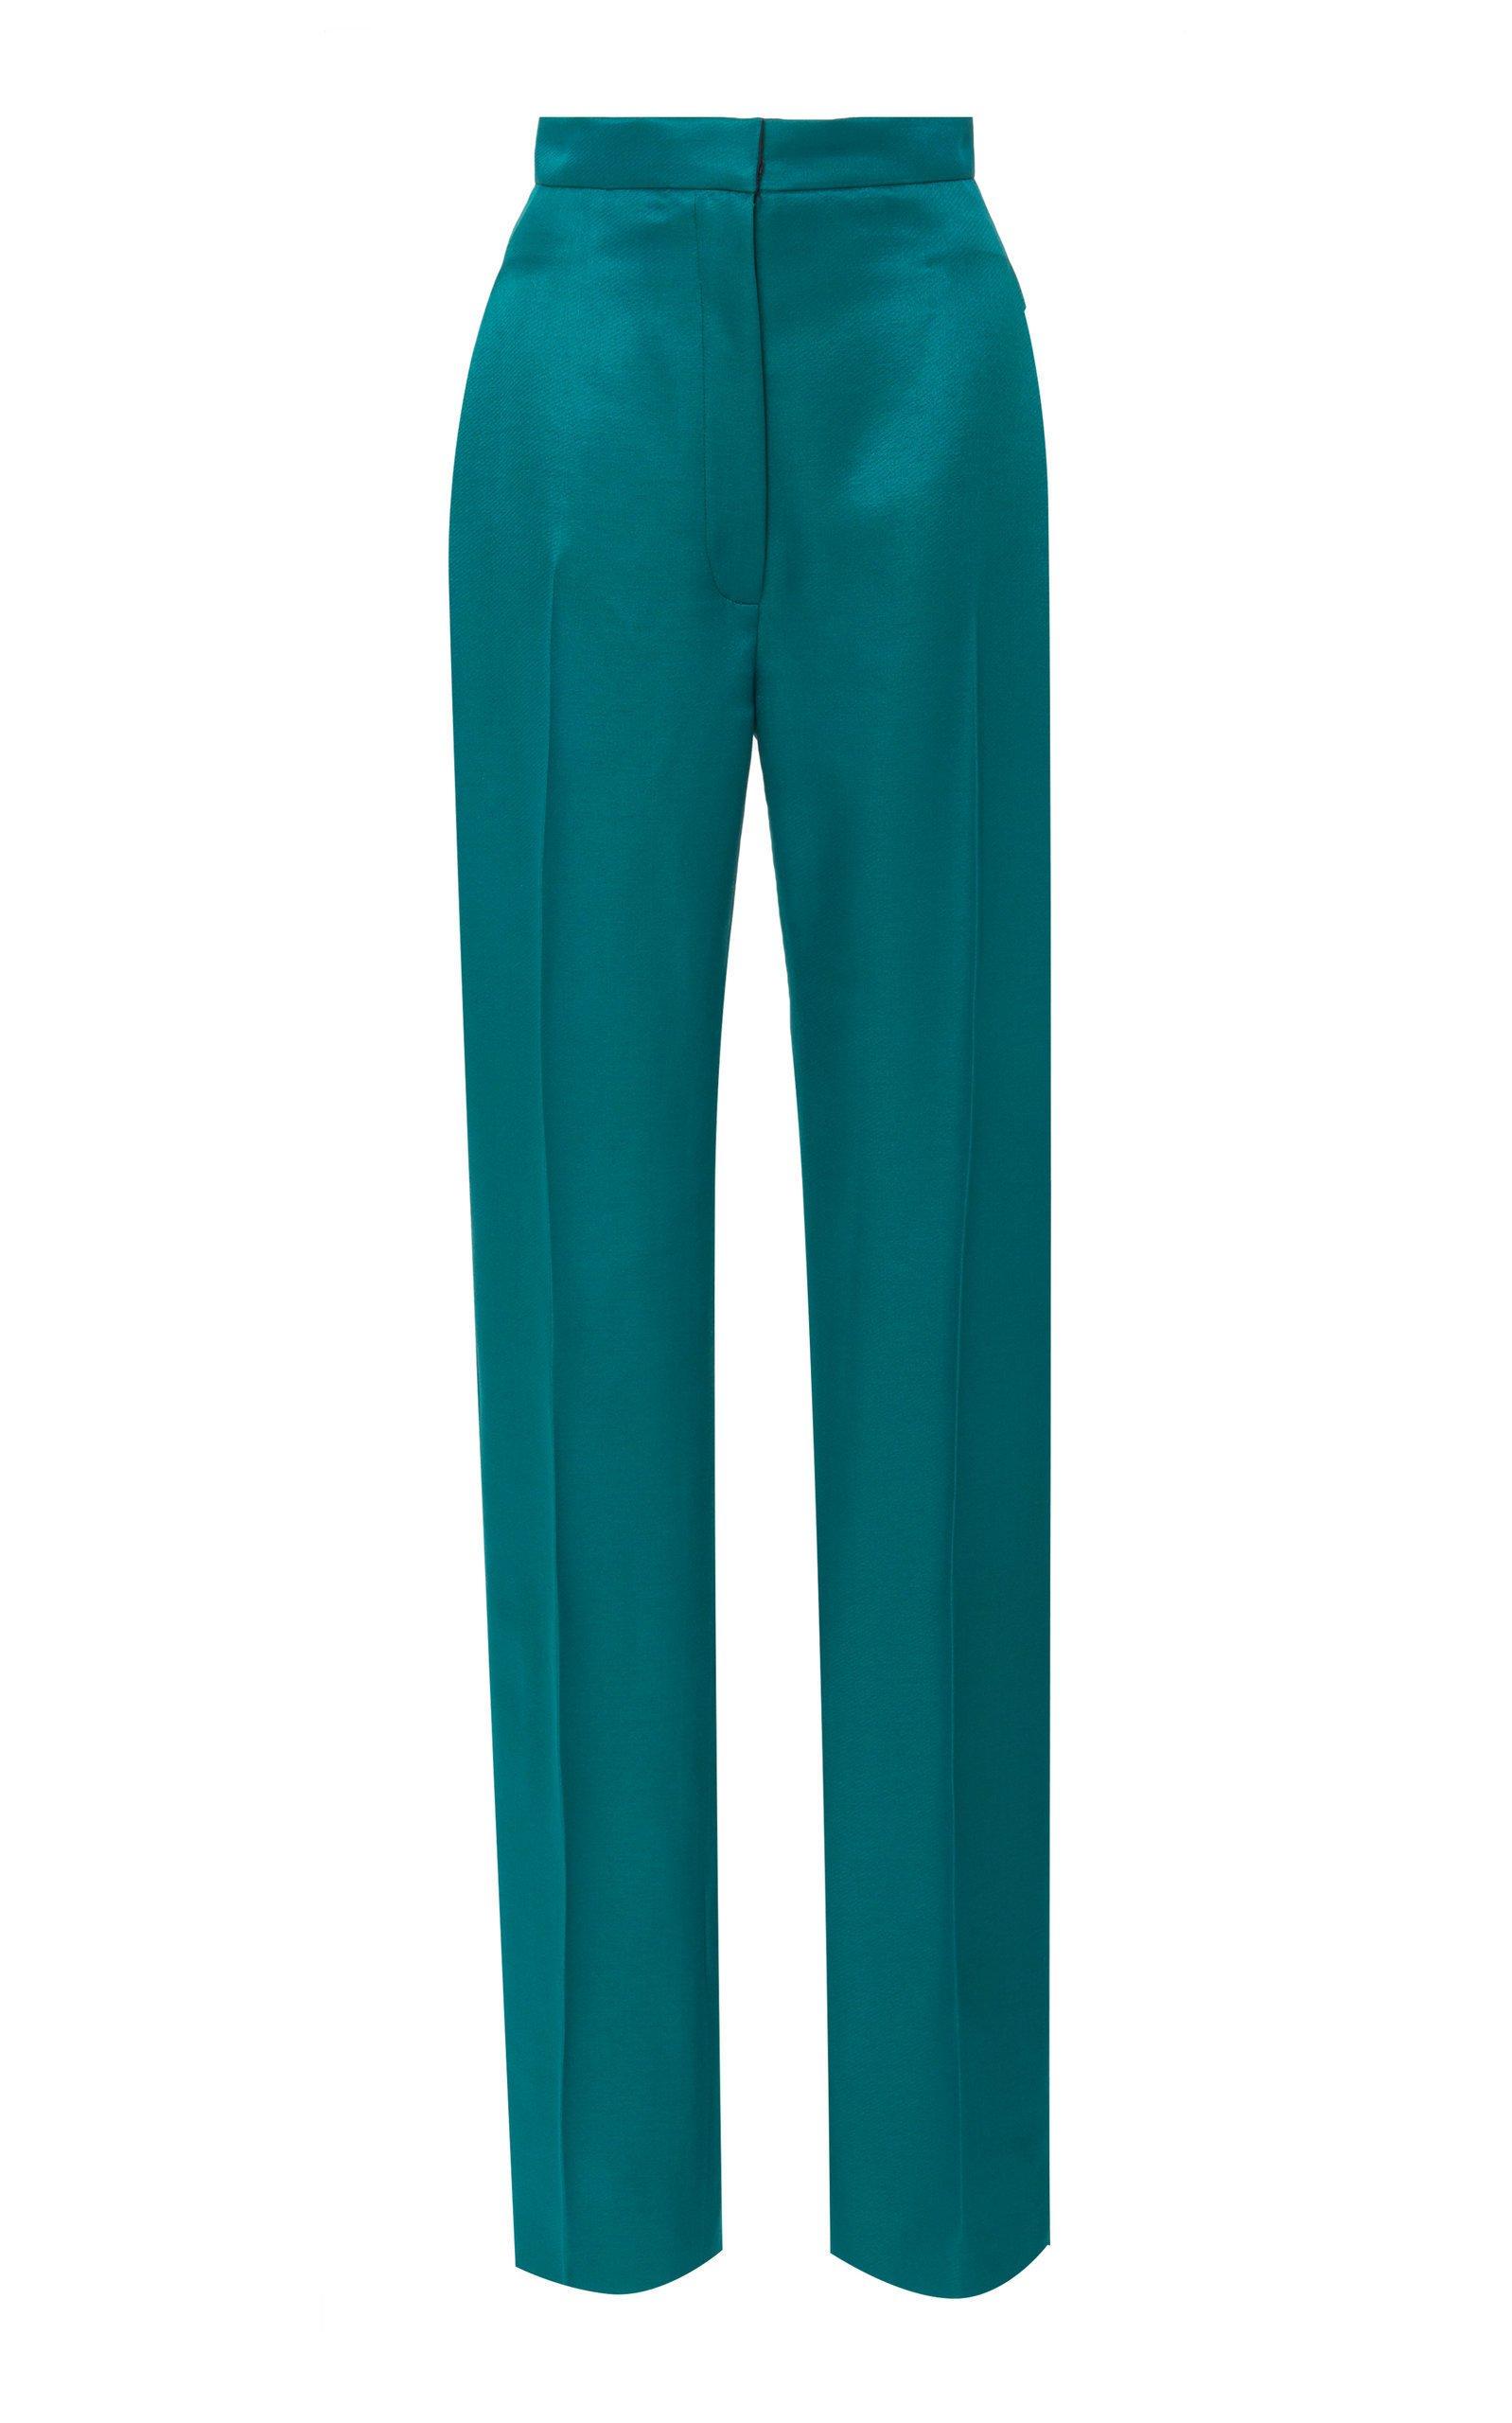 Carolina Herrera High Waisted Straight Leg Satin Suit Pants Size: 8